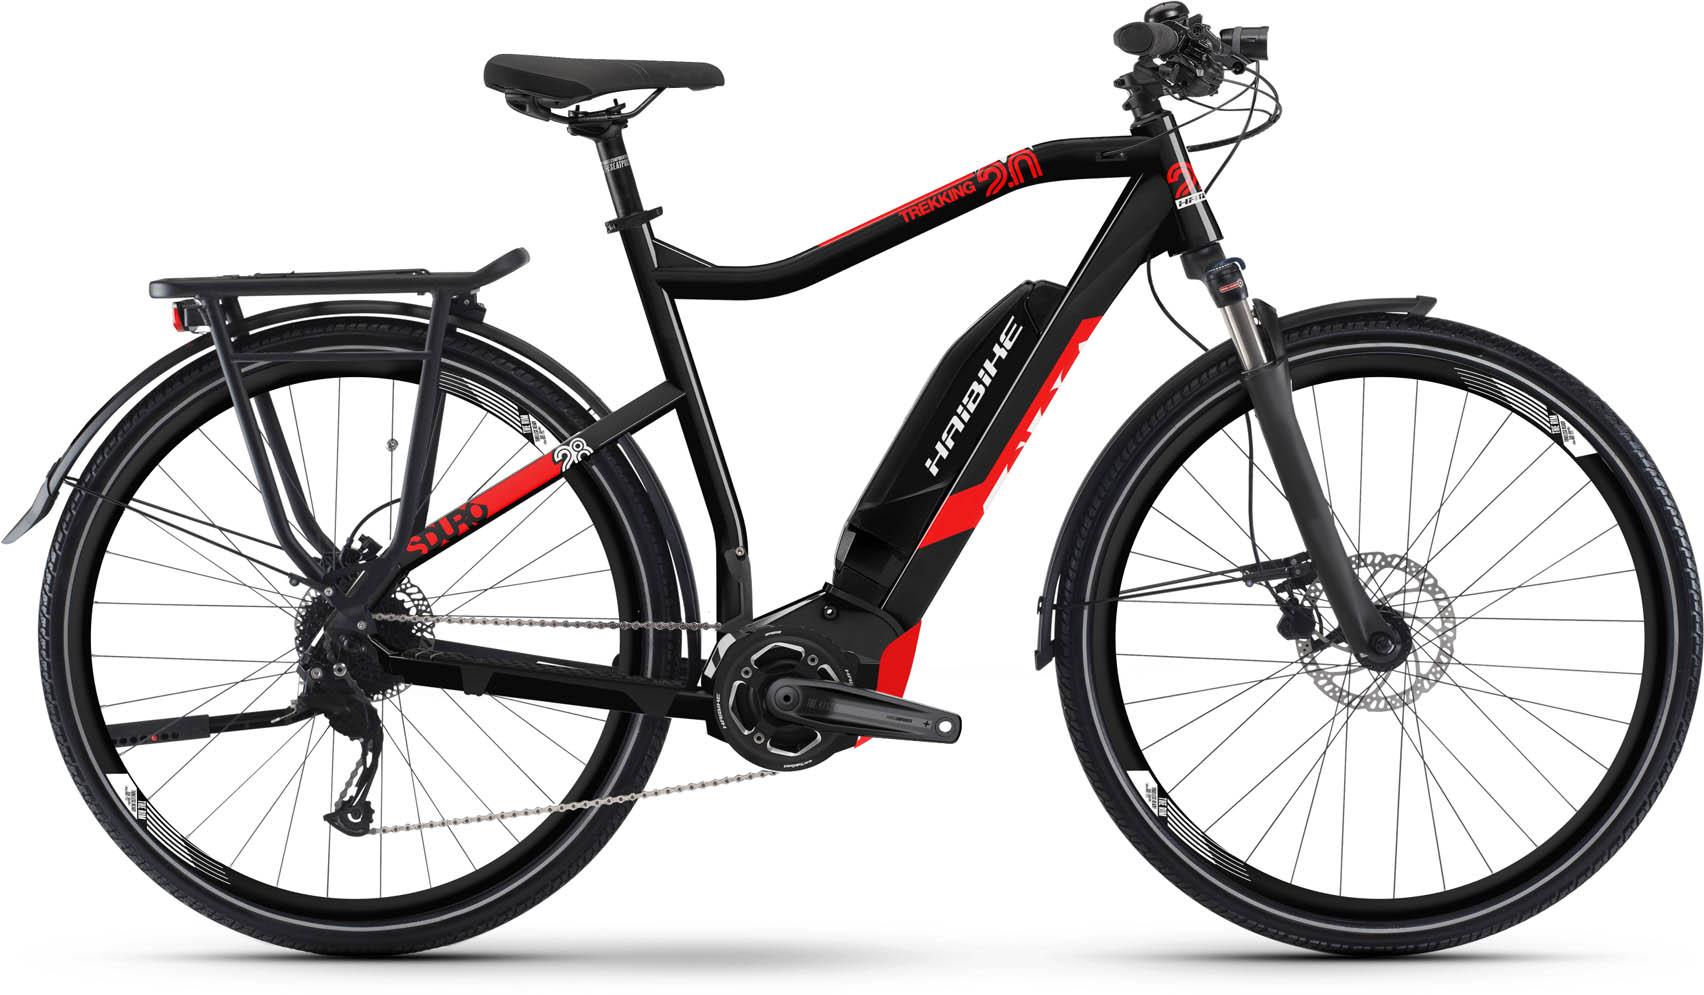 686f6844494 Touring Bikes   E-Bikes   Sale   mhw-bike.com - Bikes for all / The online  shop for bicycles, e-bikes, mountain bikes, trekking bikes and racing bikes